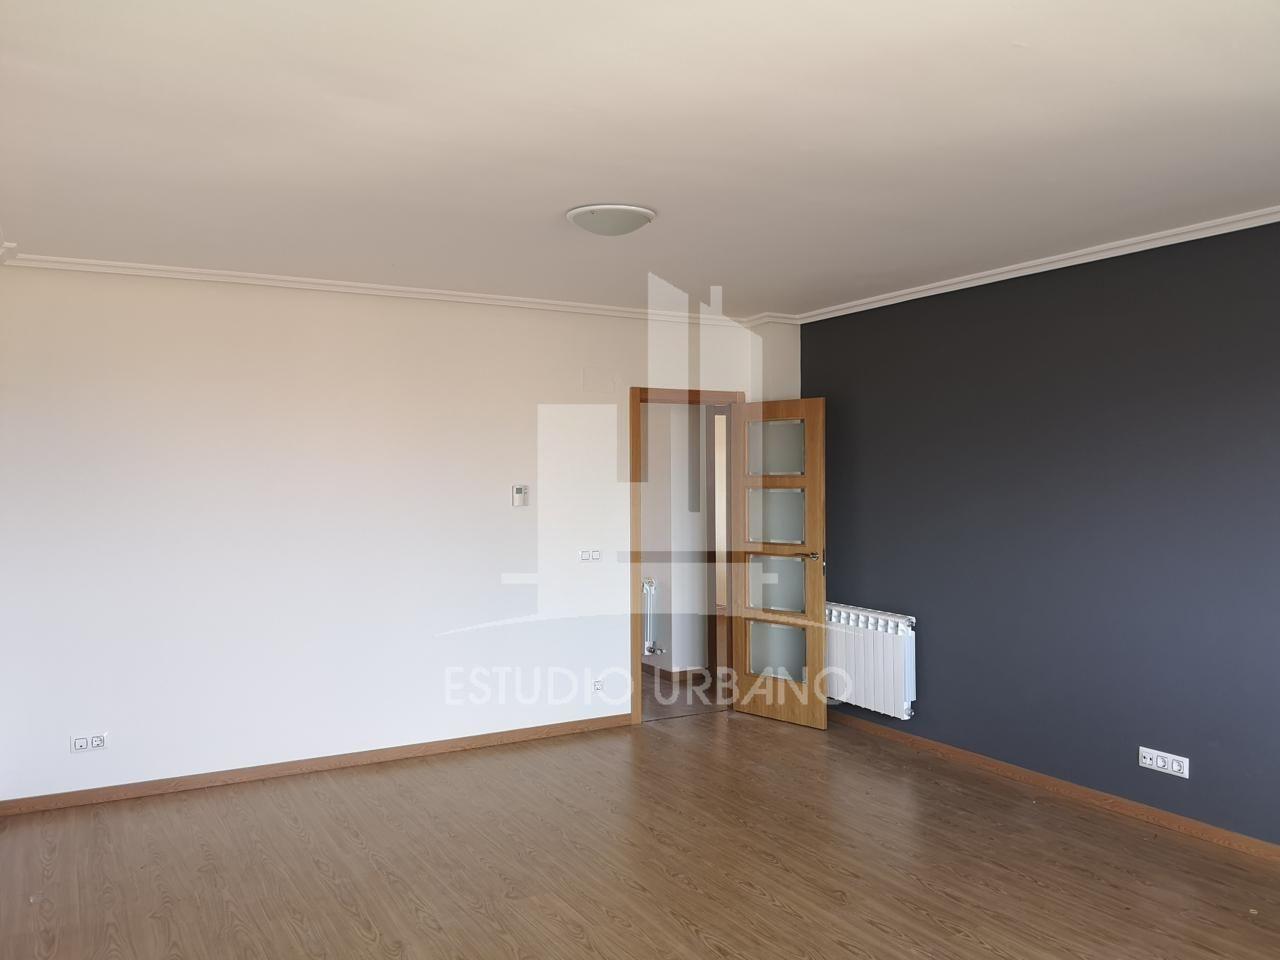 villas en penasolana · calle-emilia-pardo-bazan-37192 170000€